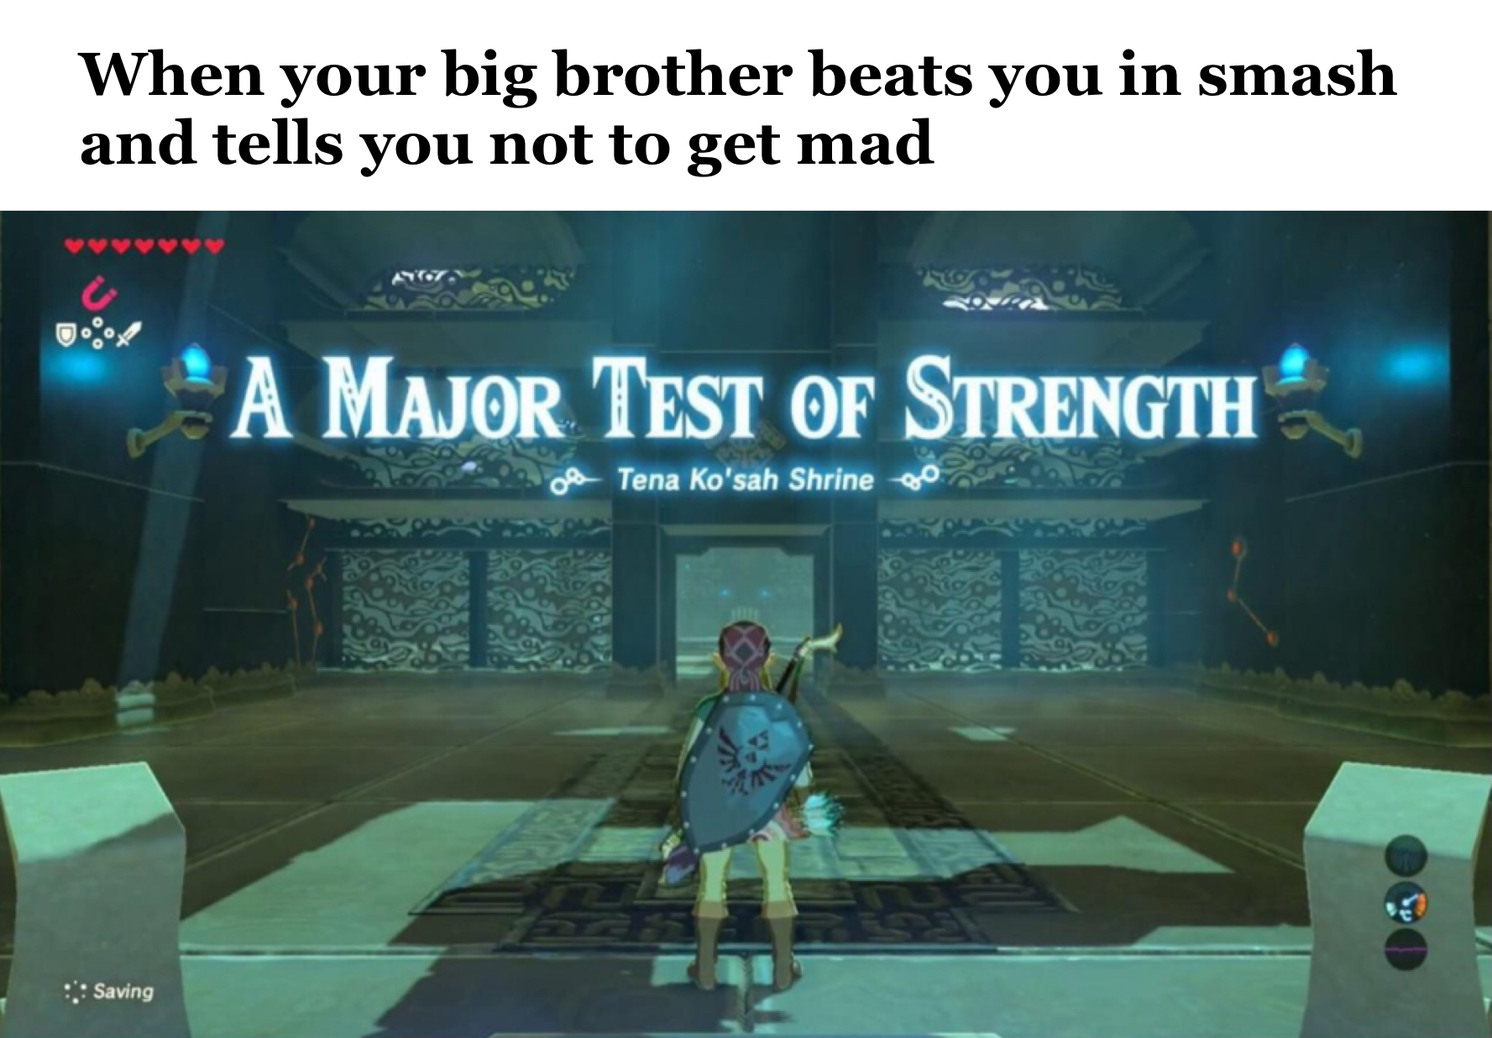 A MAJOR test - meme